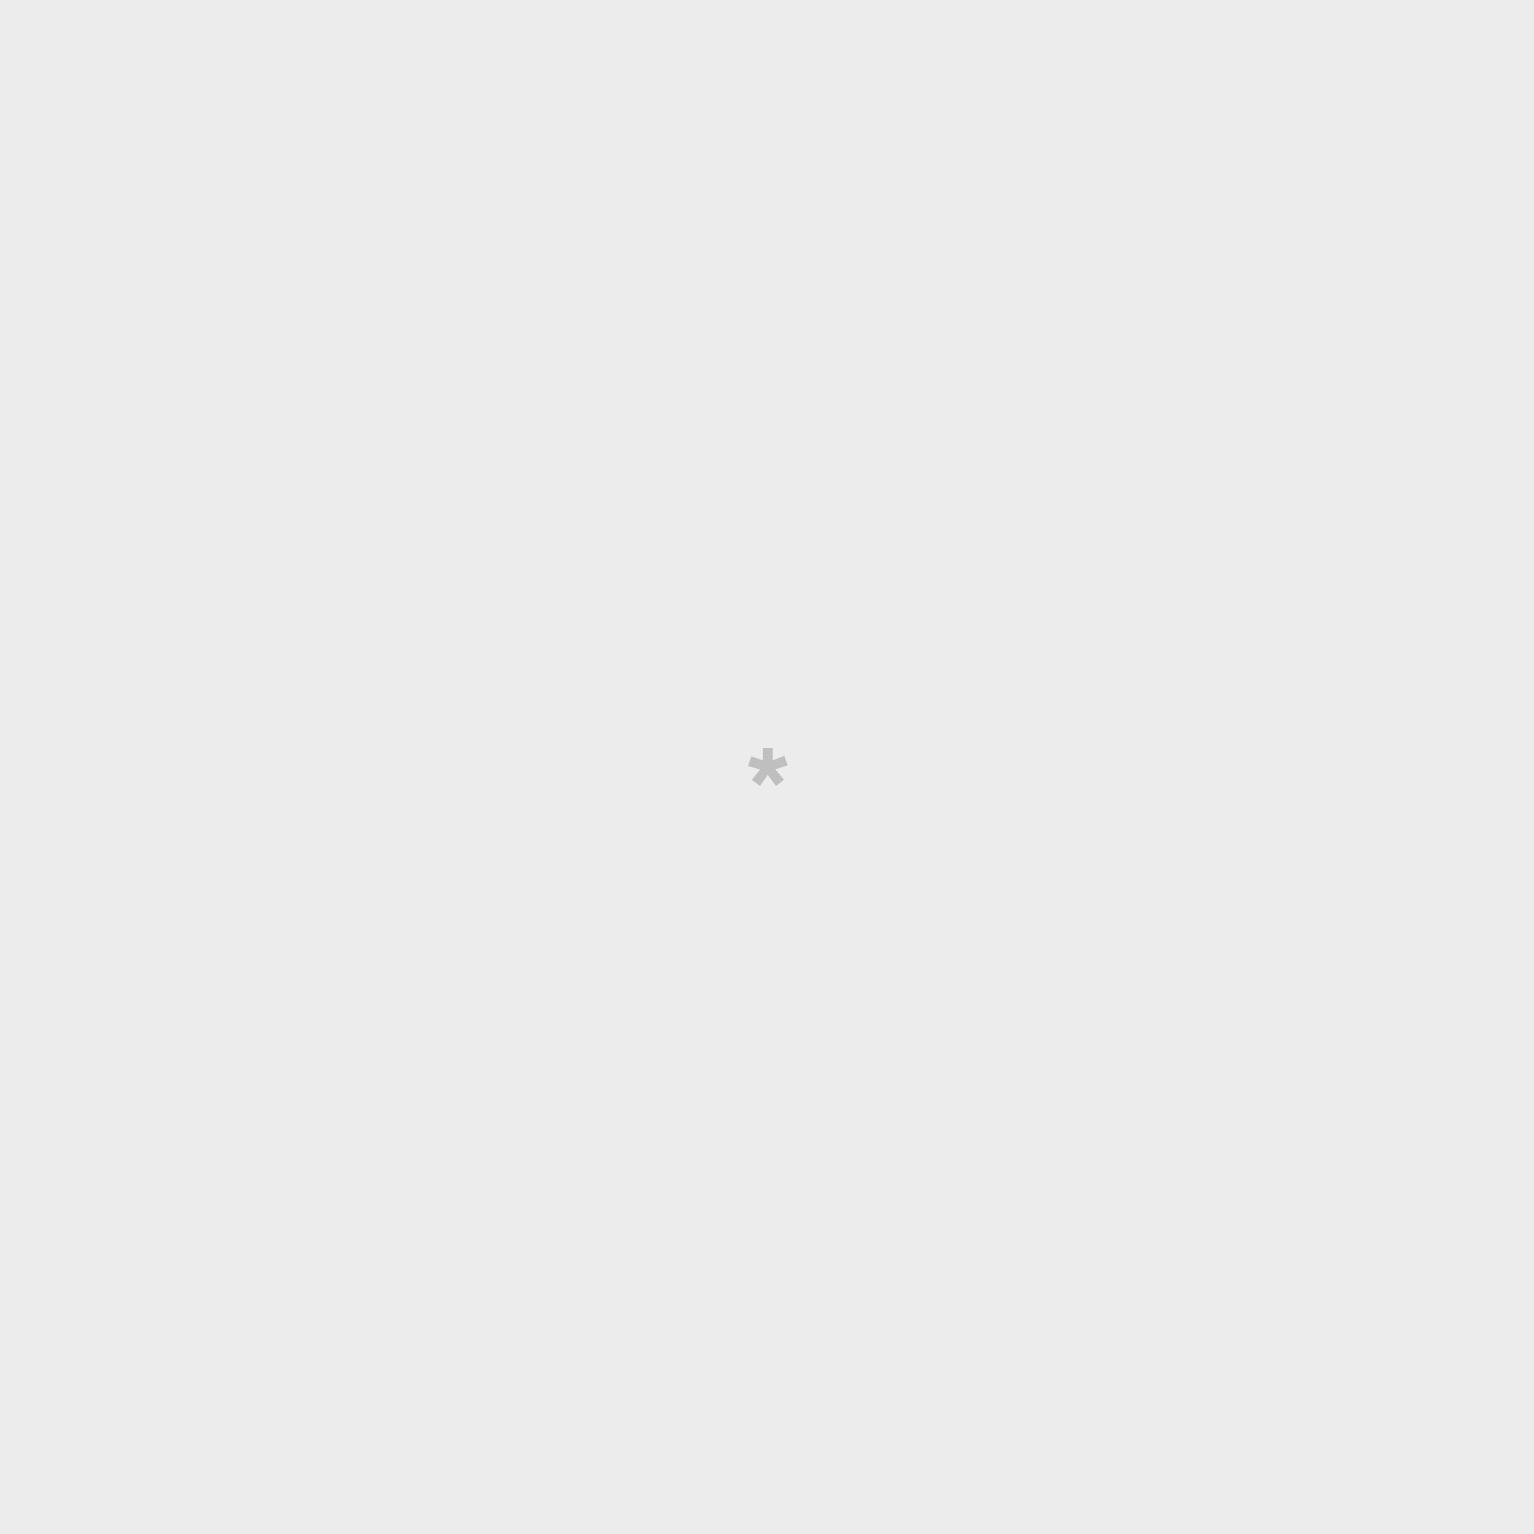 Mug - I love you from top to bottom